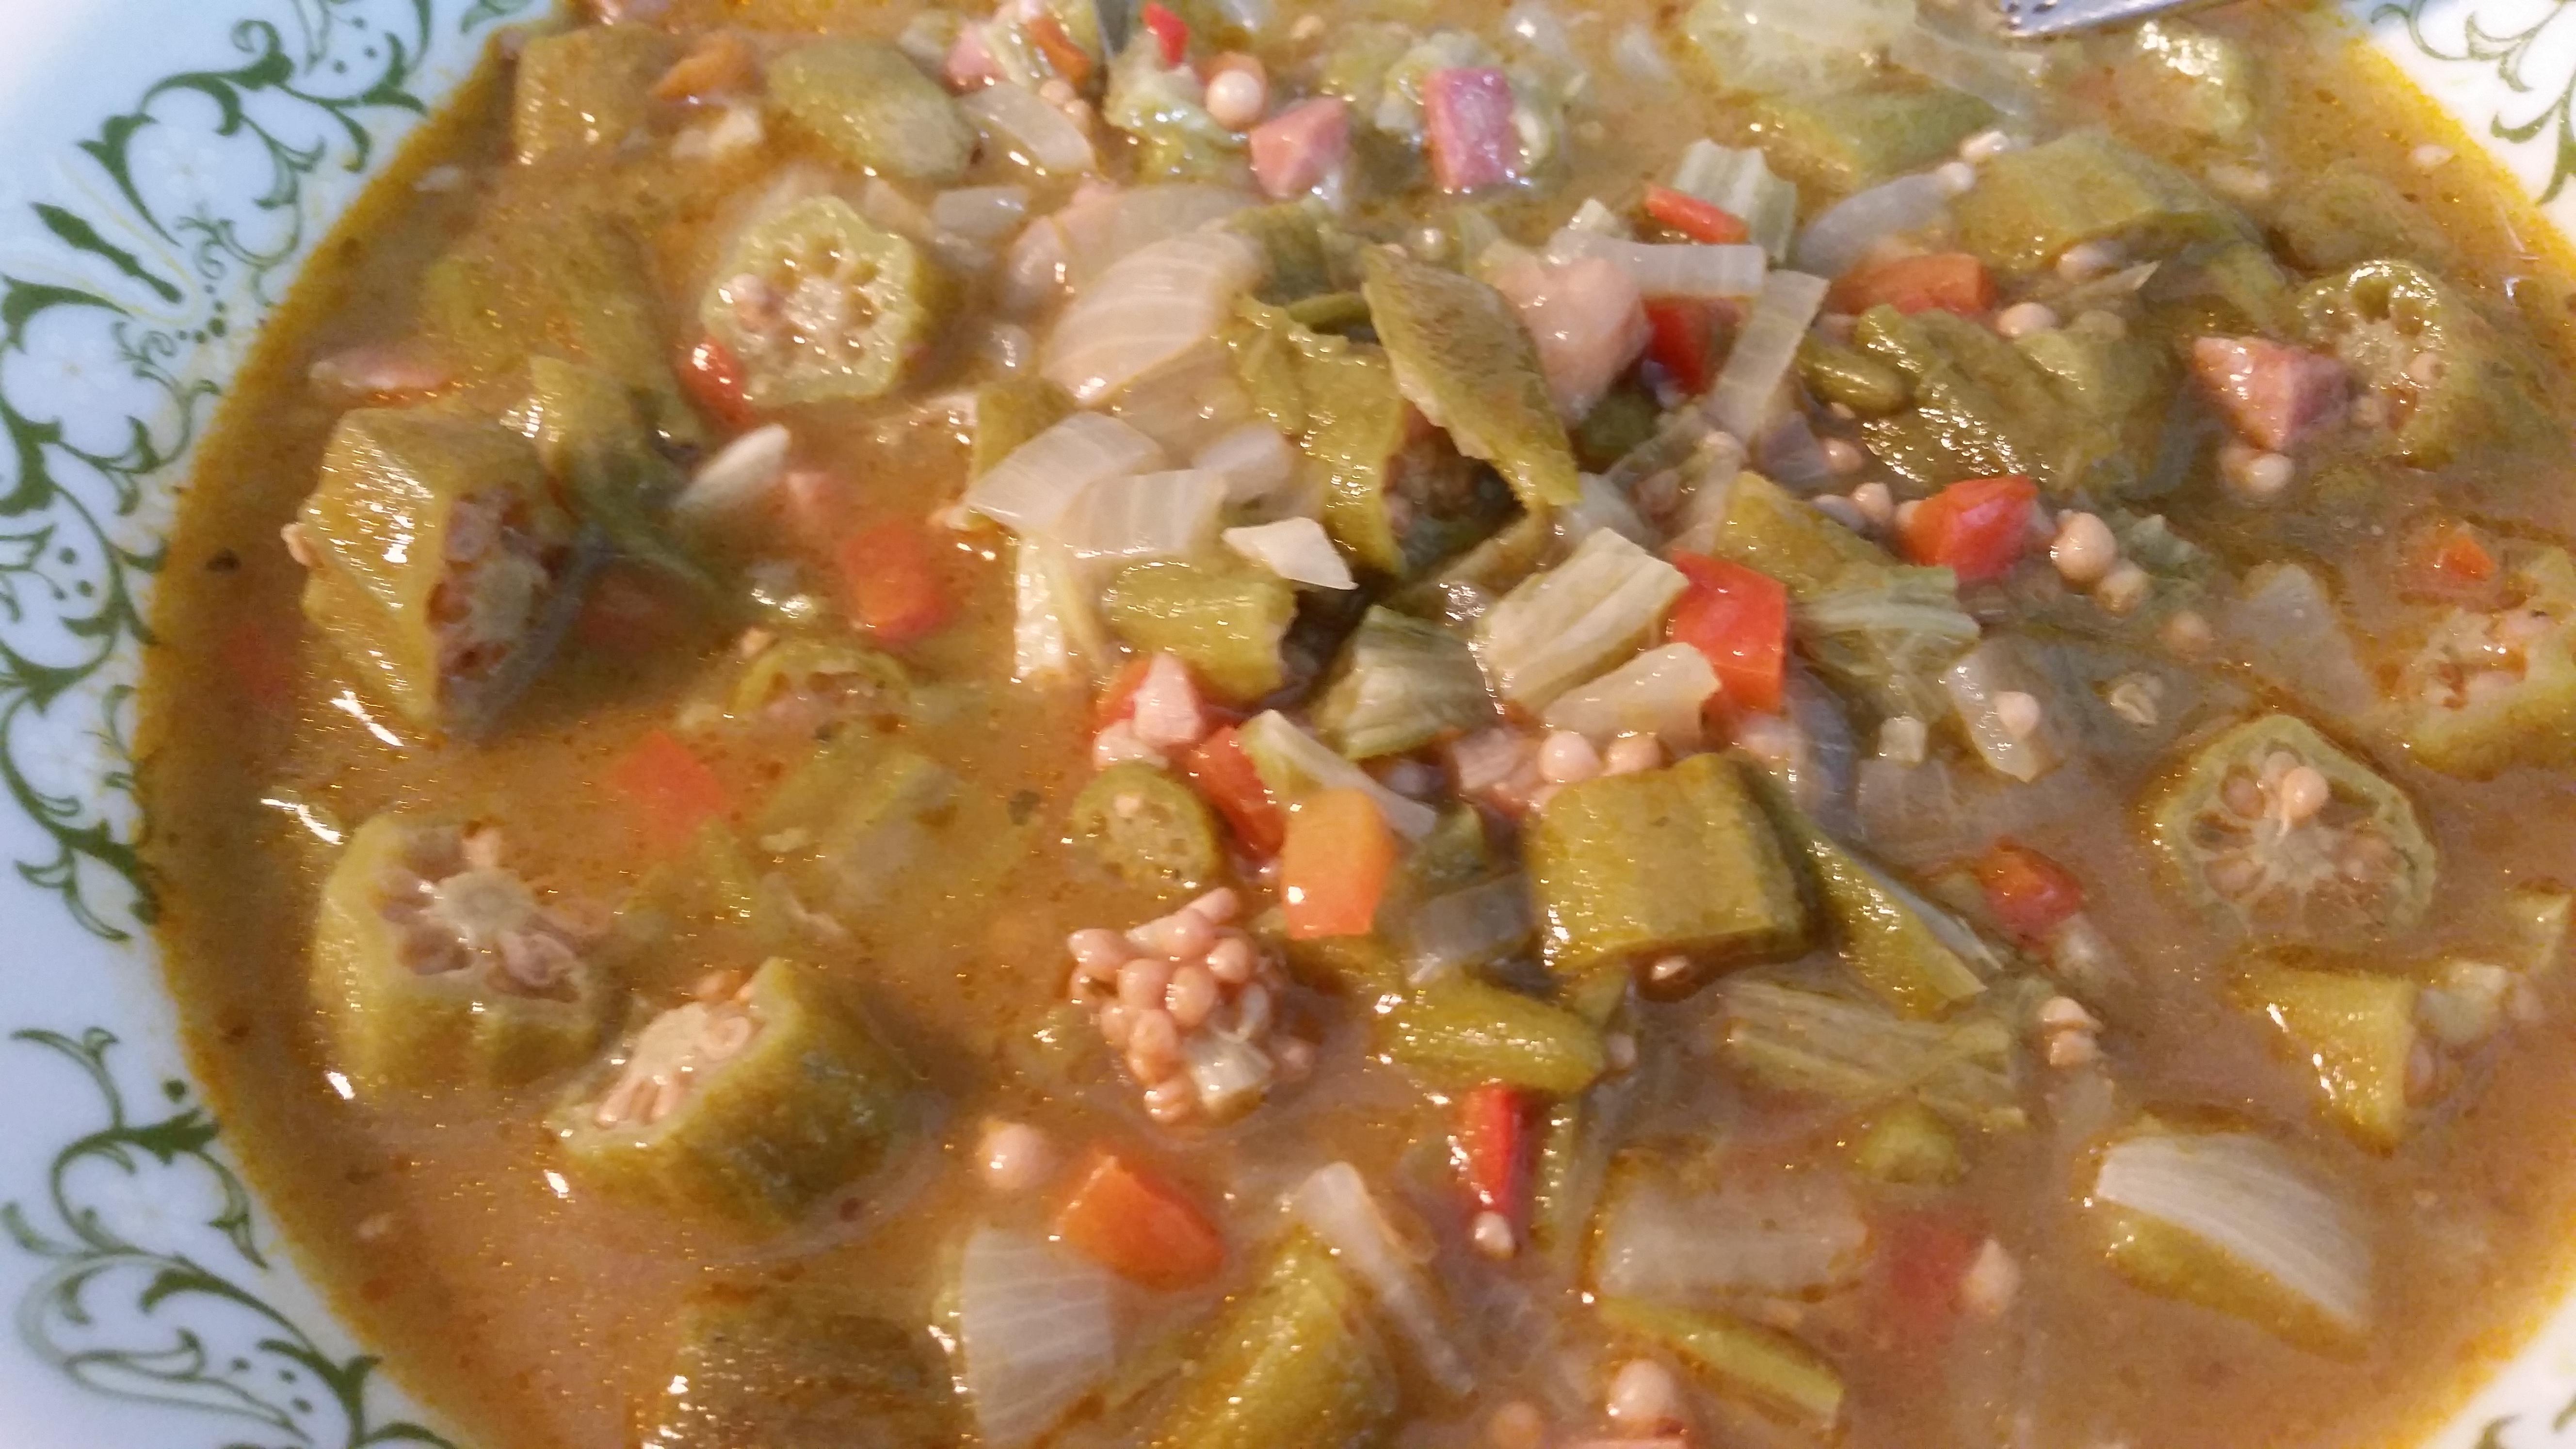 guingamb u00f3 guisado  stewed okra  even if you think it u2019s